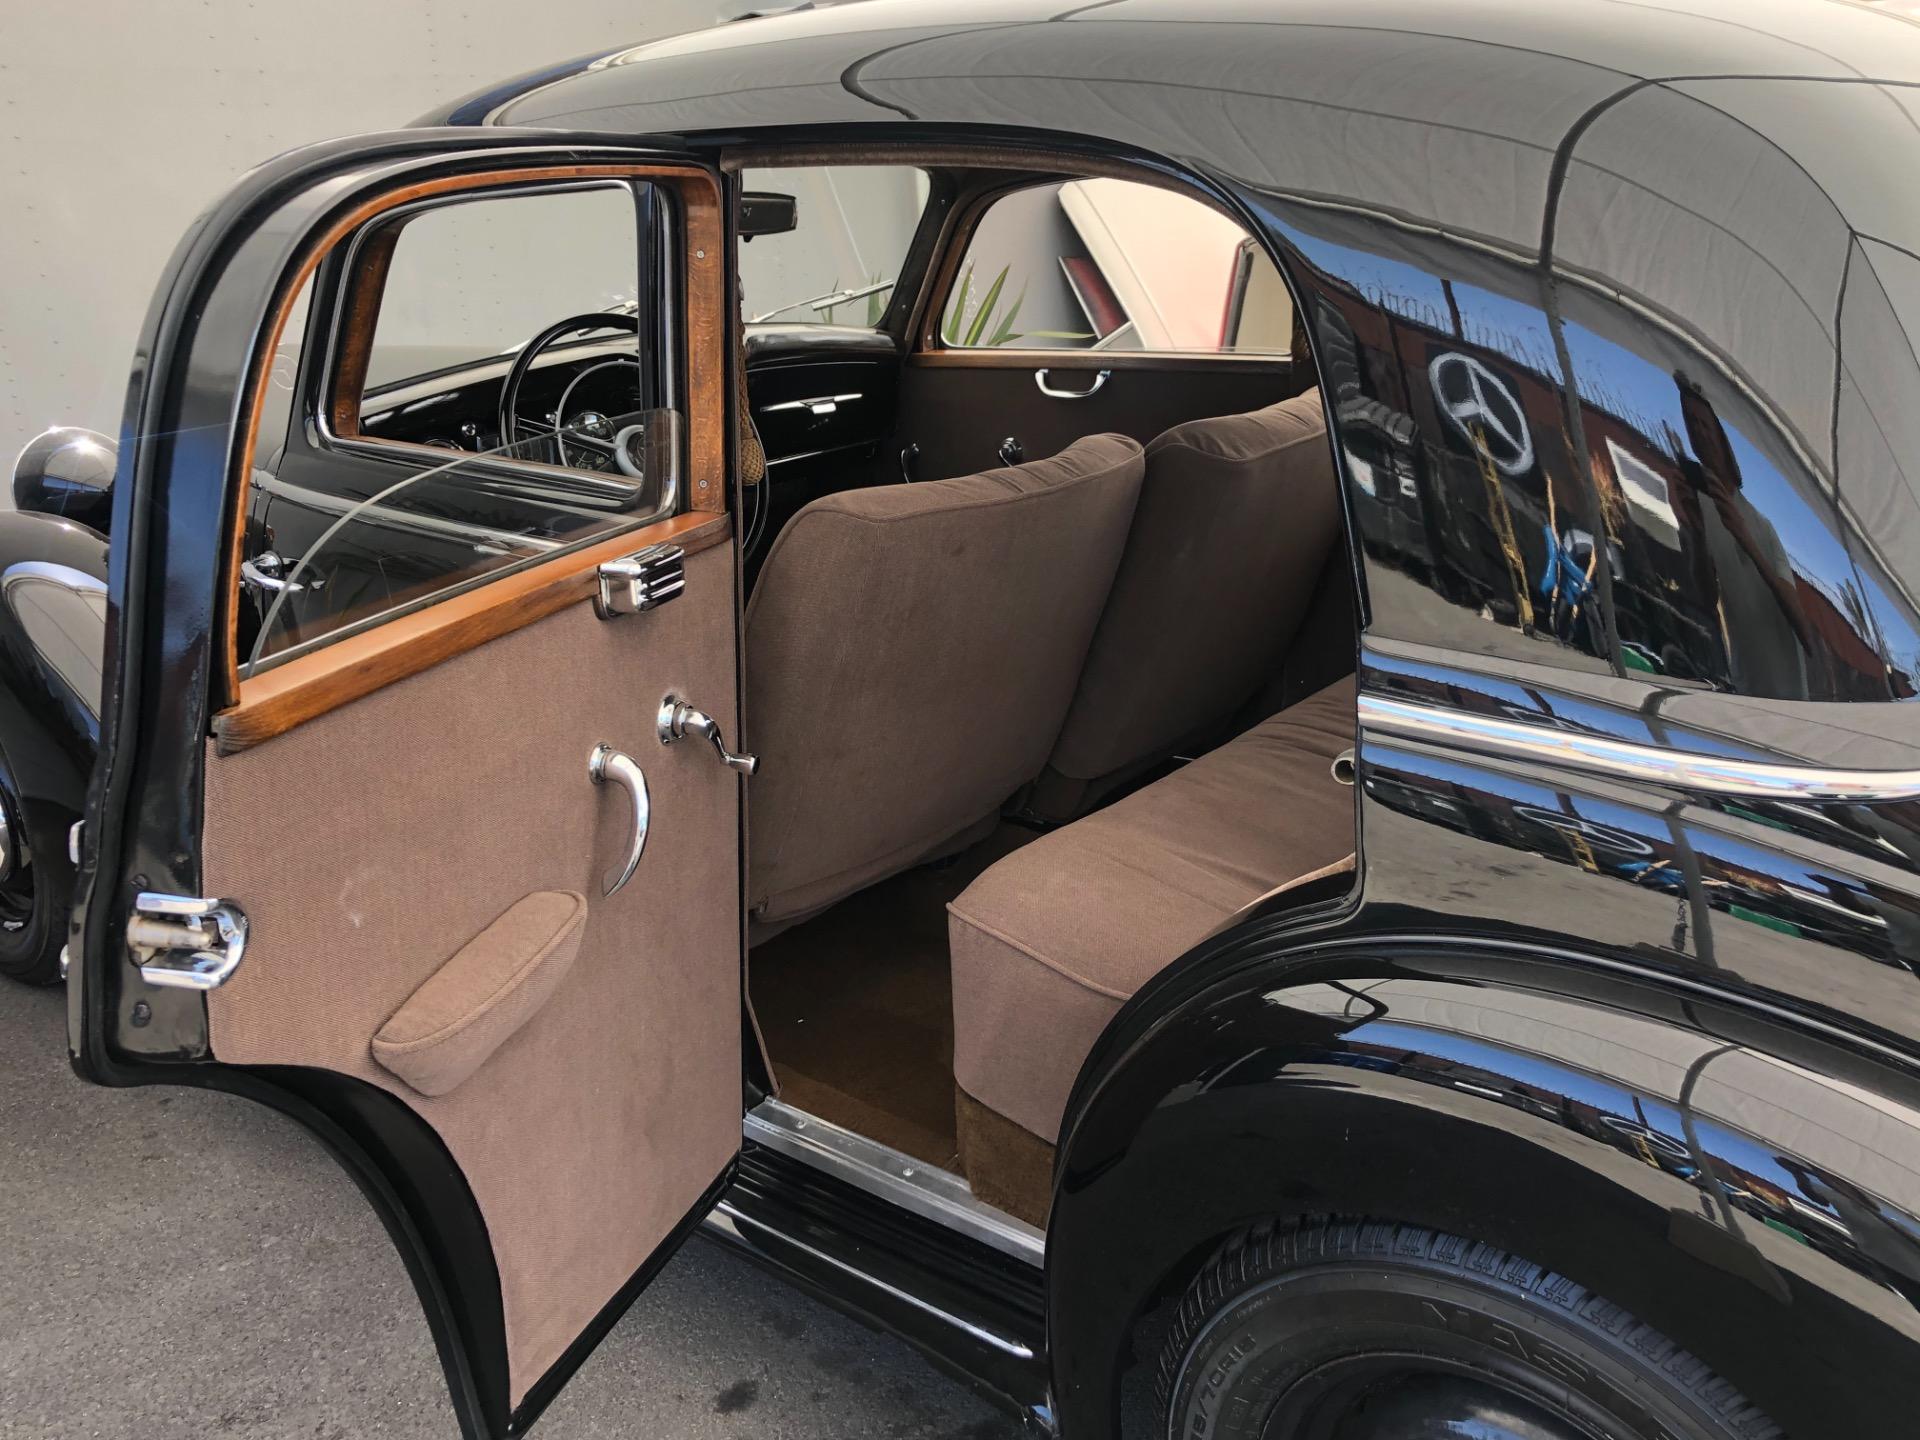 Used 1952 MERCEDES BENZ 170 SB